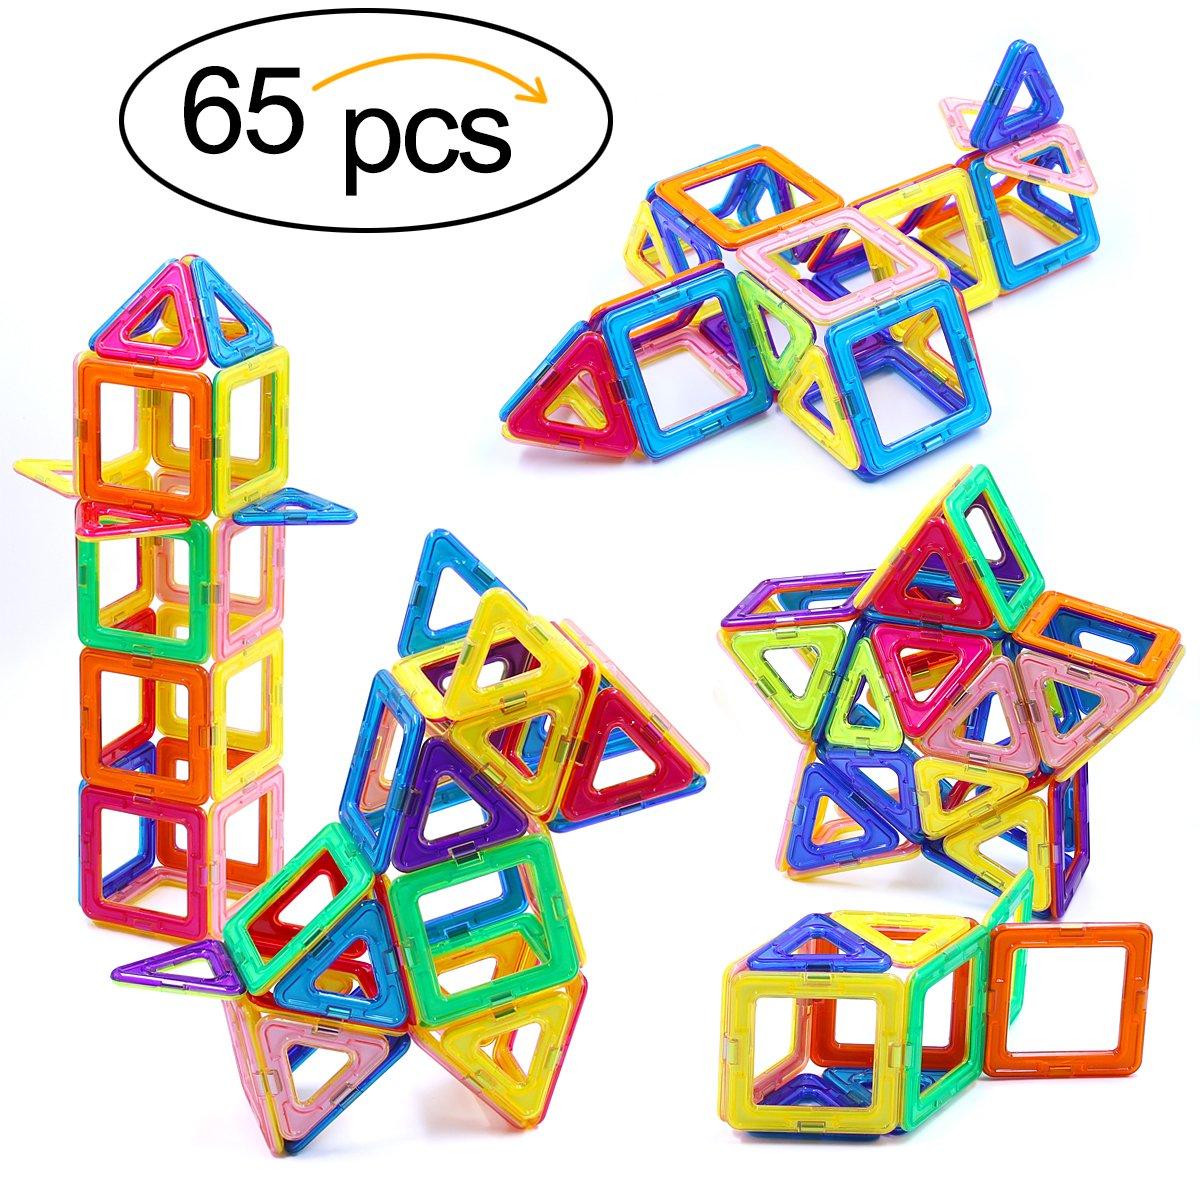 Ranphykx Magnetic Blocks, 65 Piece Magnetic Building Blocks Set Magnetic Tiles Educational Toys for Kids